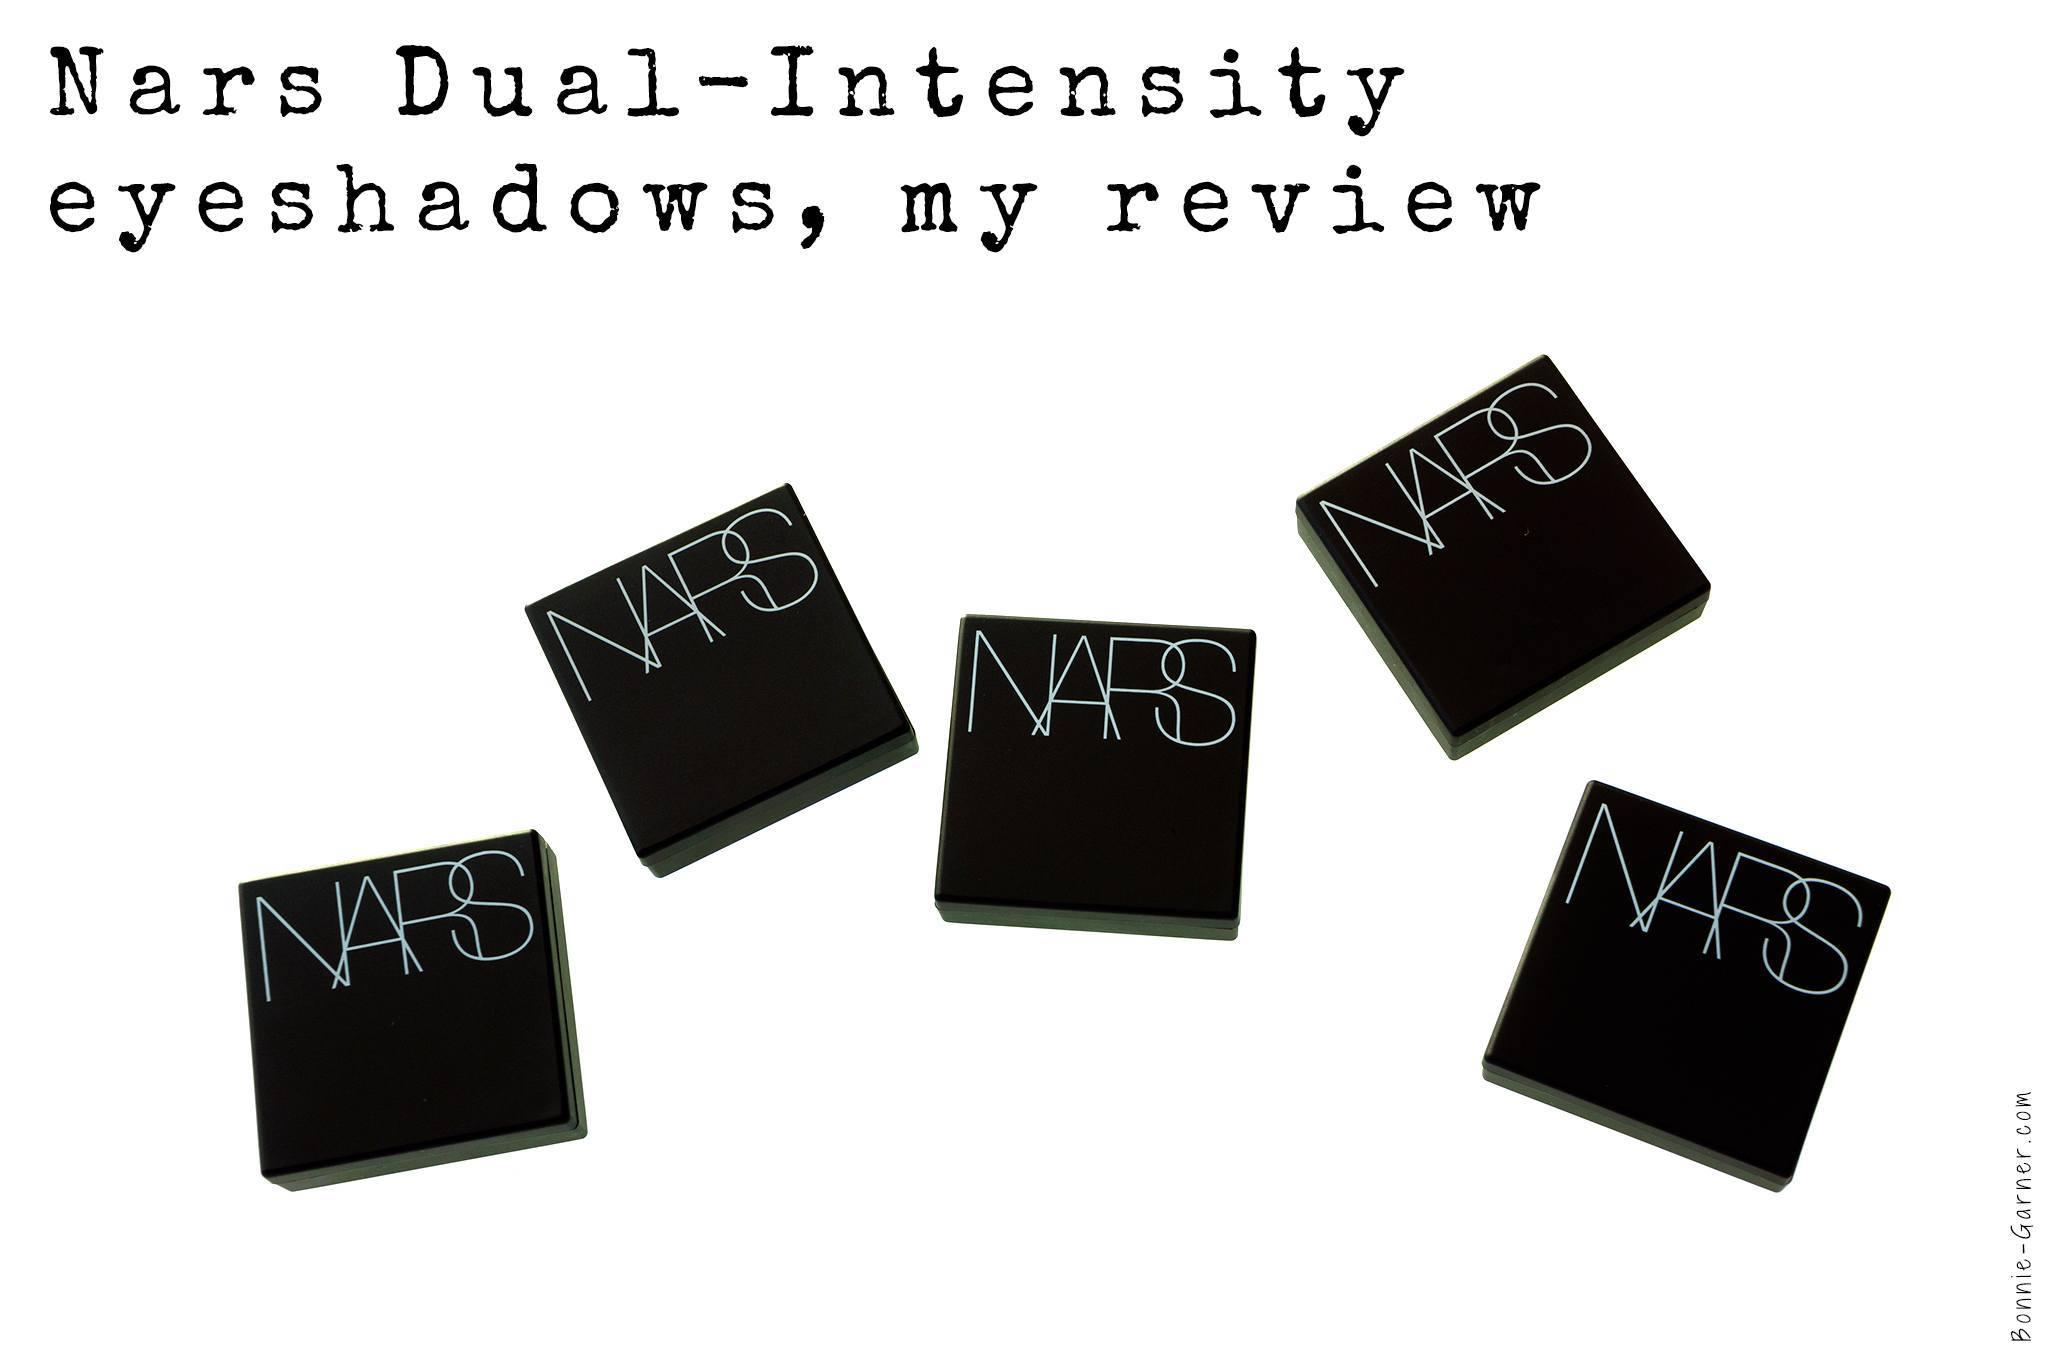 Nars Dual-Intensity eyeshadows, my review